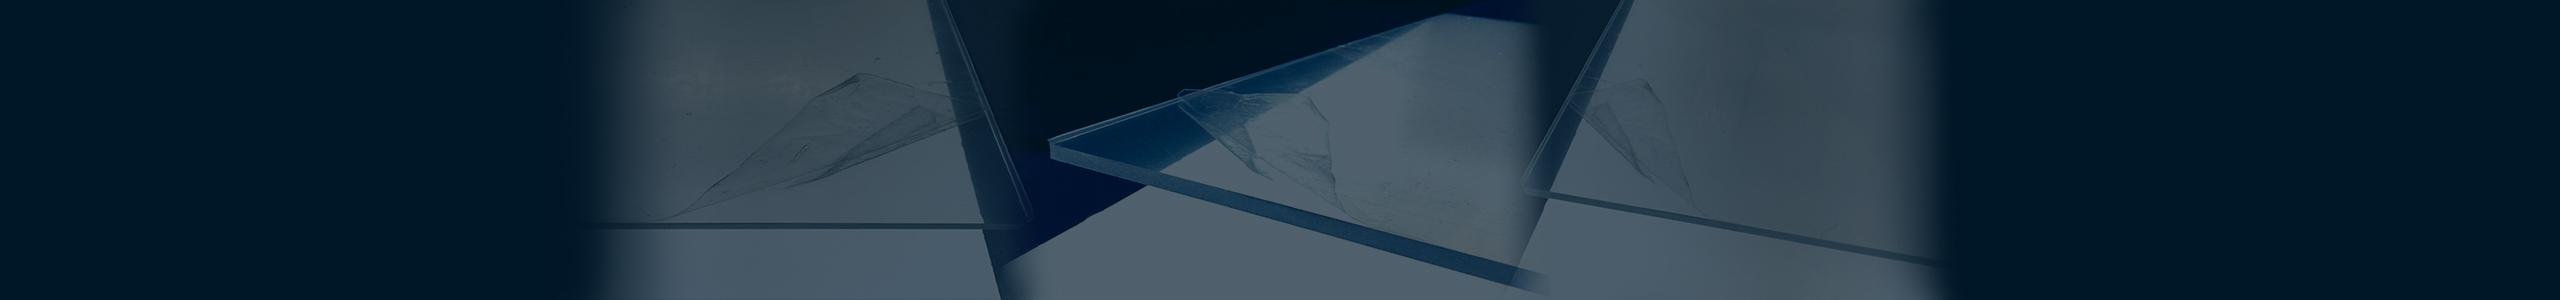 PVC Transparente en Placa